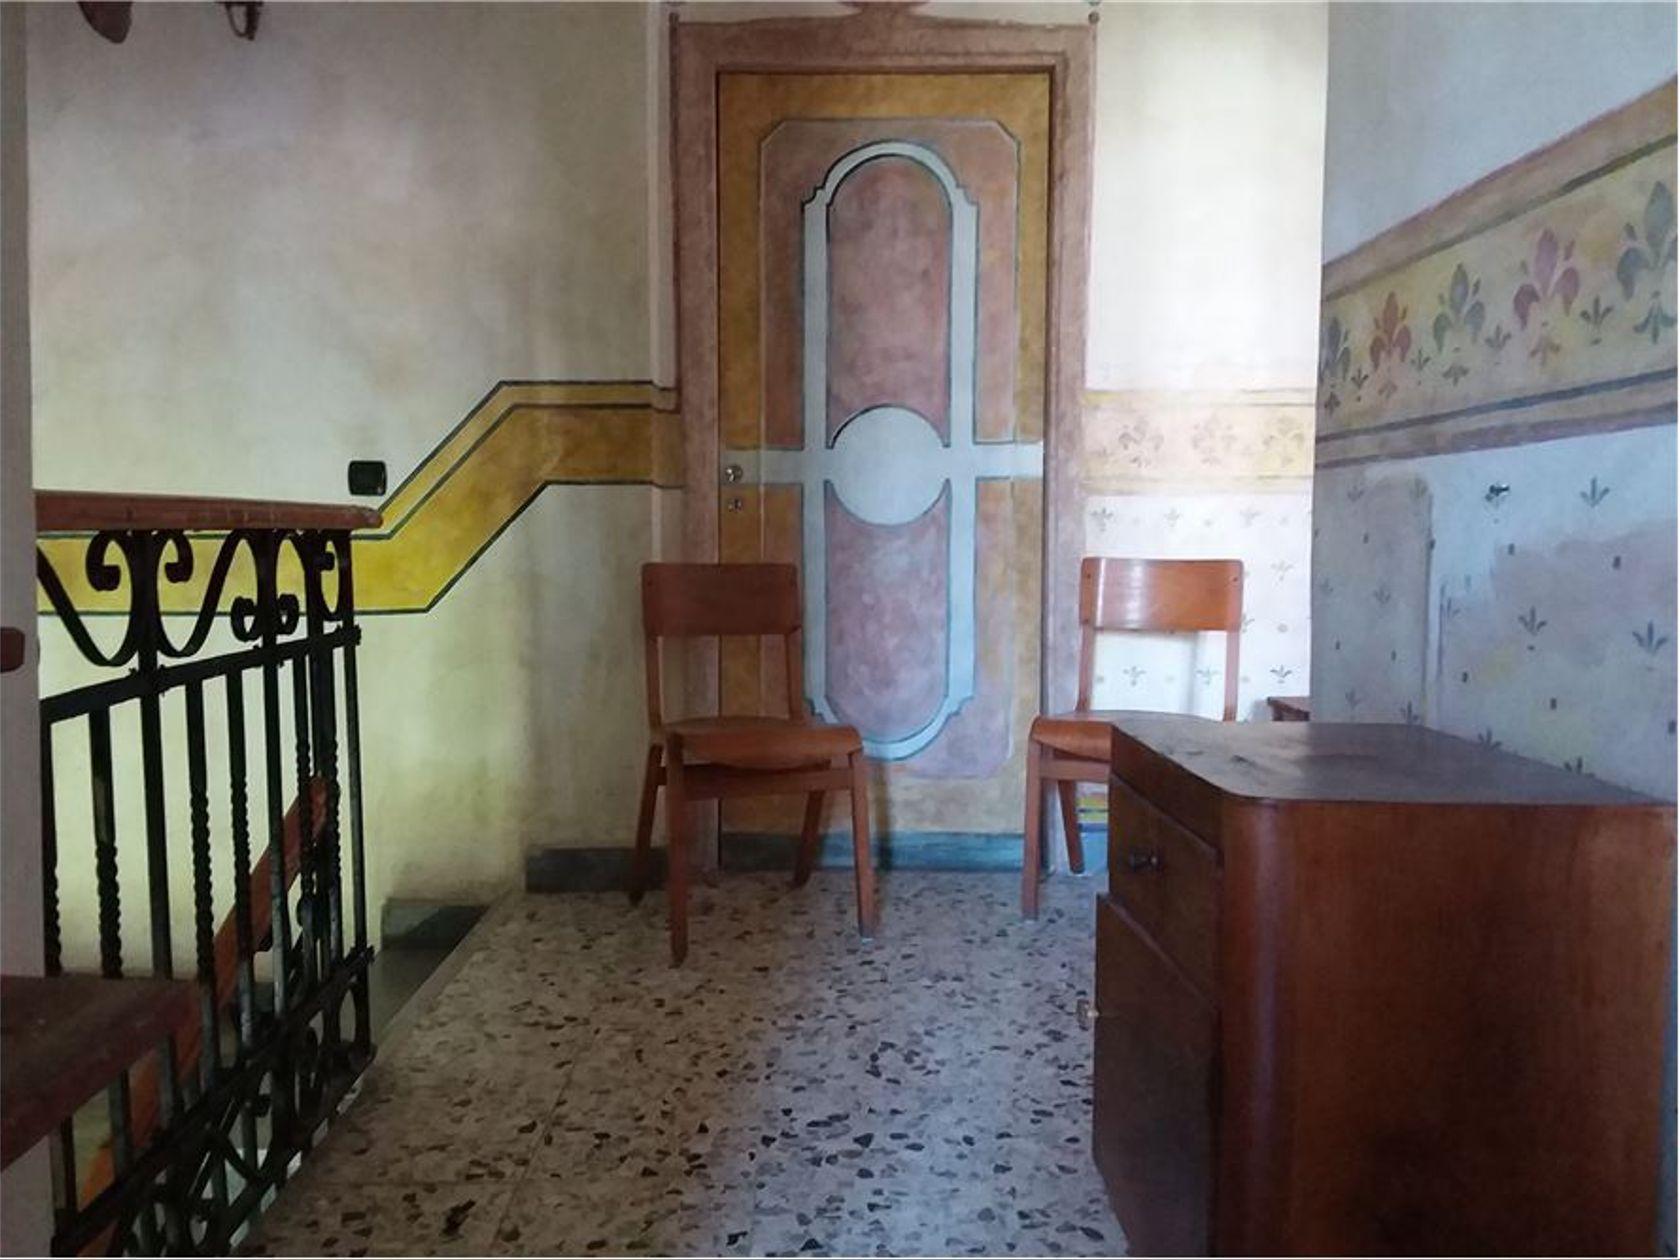 Albergo/Hotel Alfedena, AQ Vendita - Foto 2